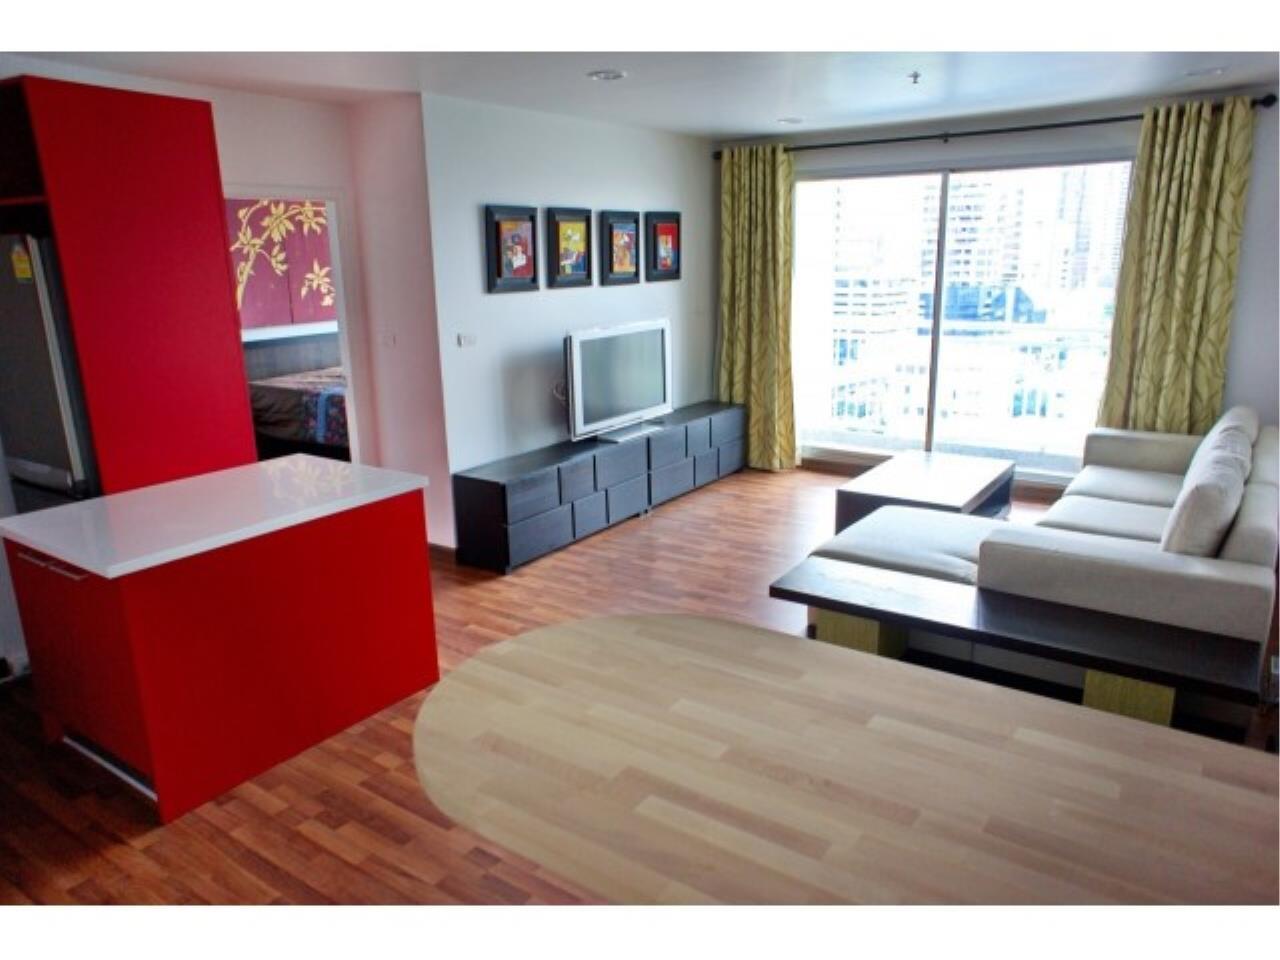 You Estate Agency's Sale Centric scene paholyathin 9, 59 sq.m Ari BTS 6